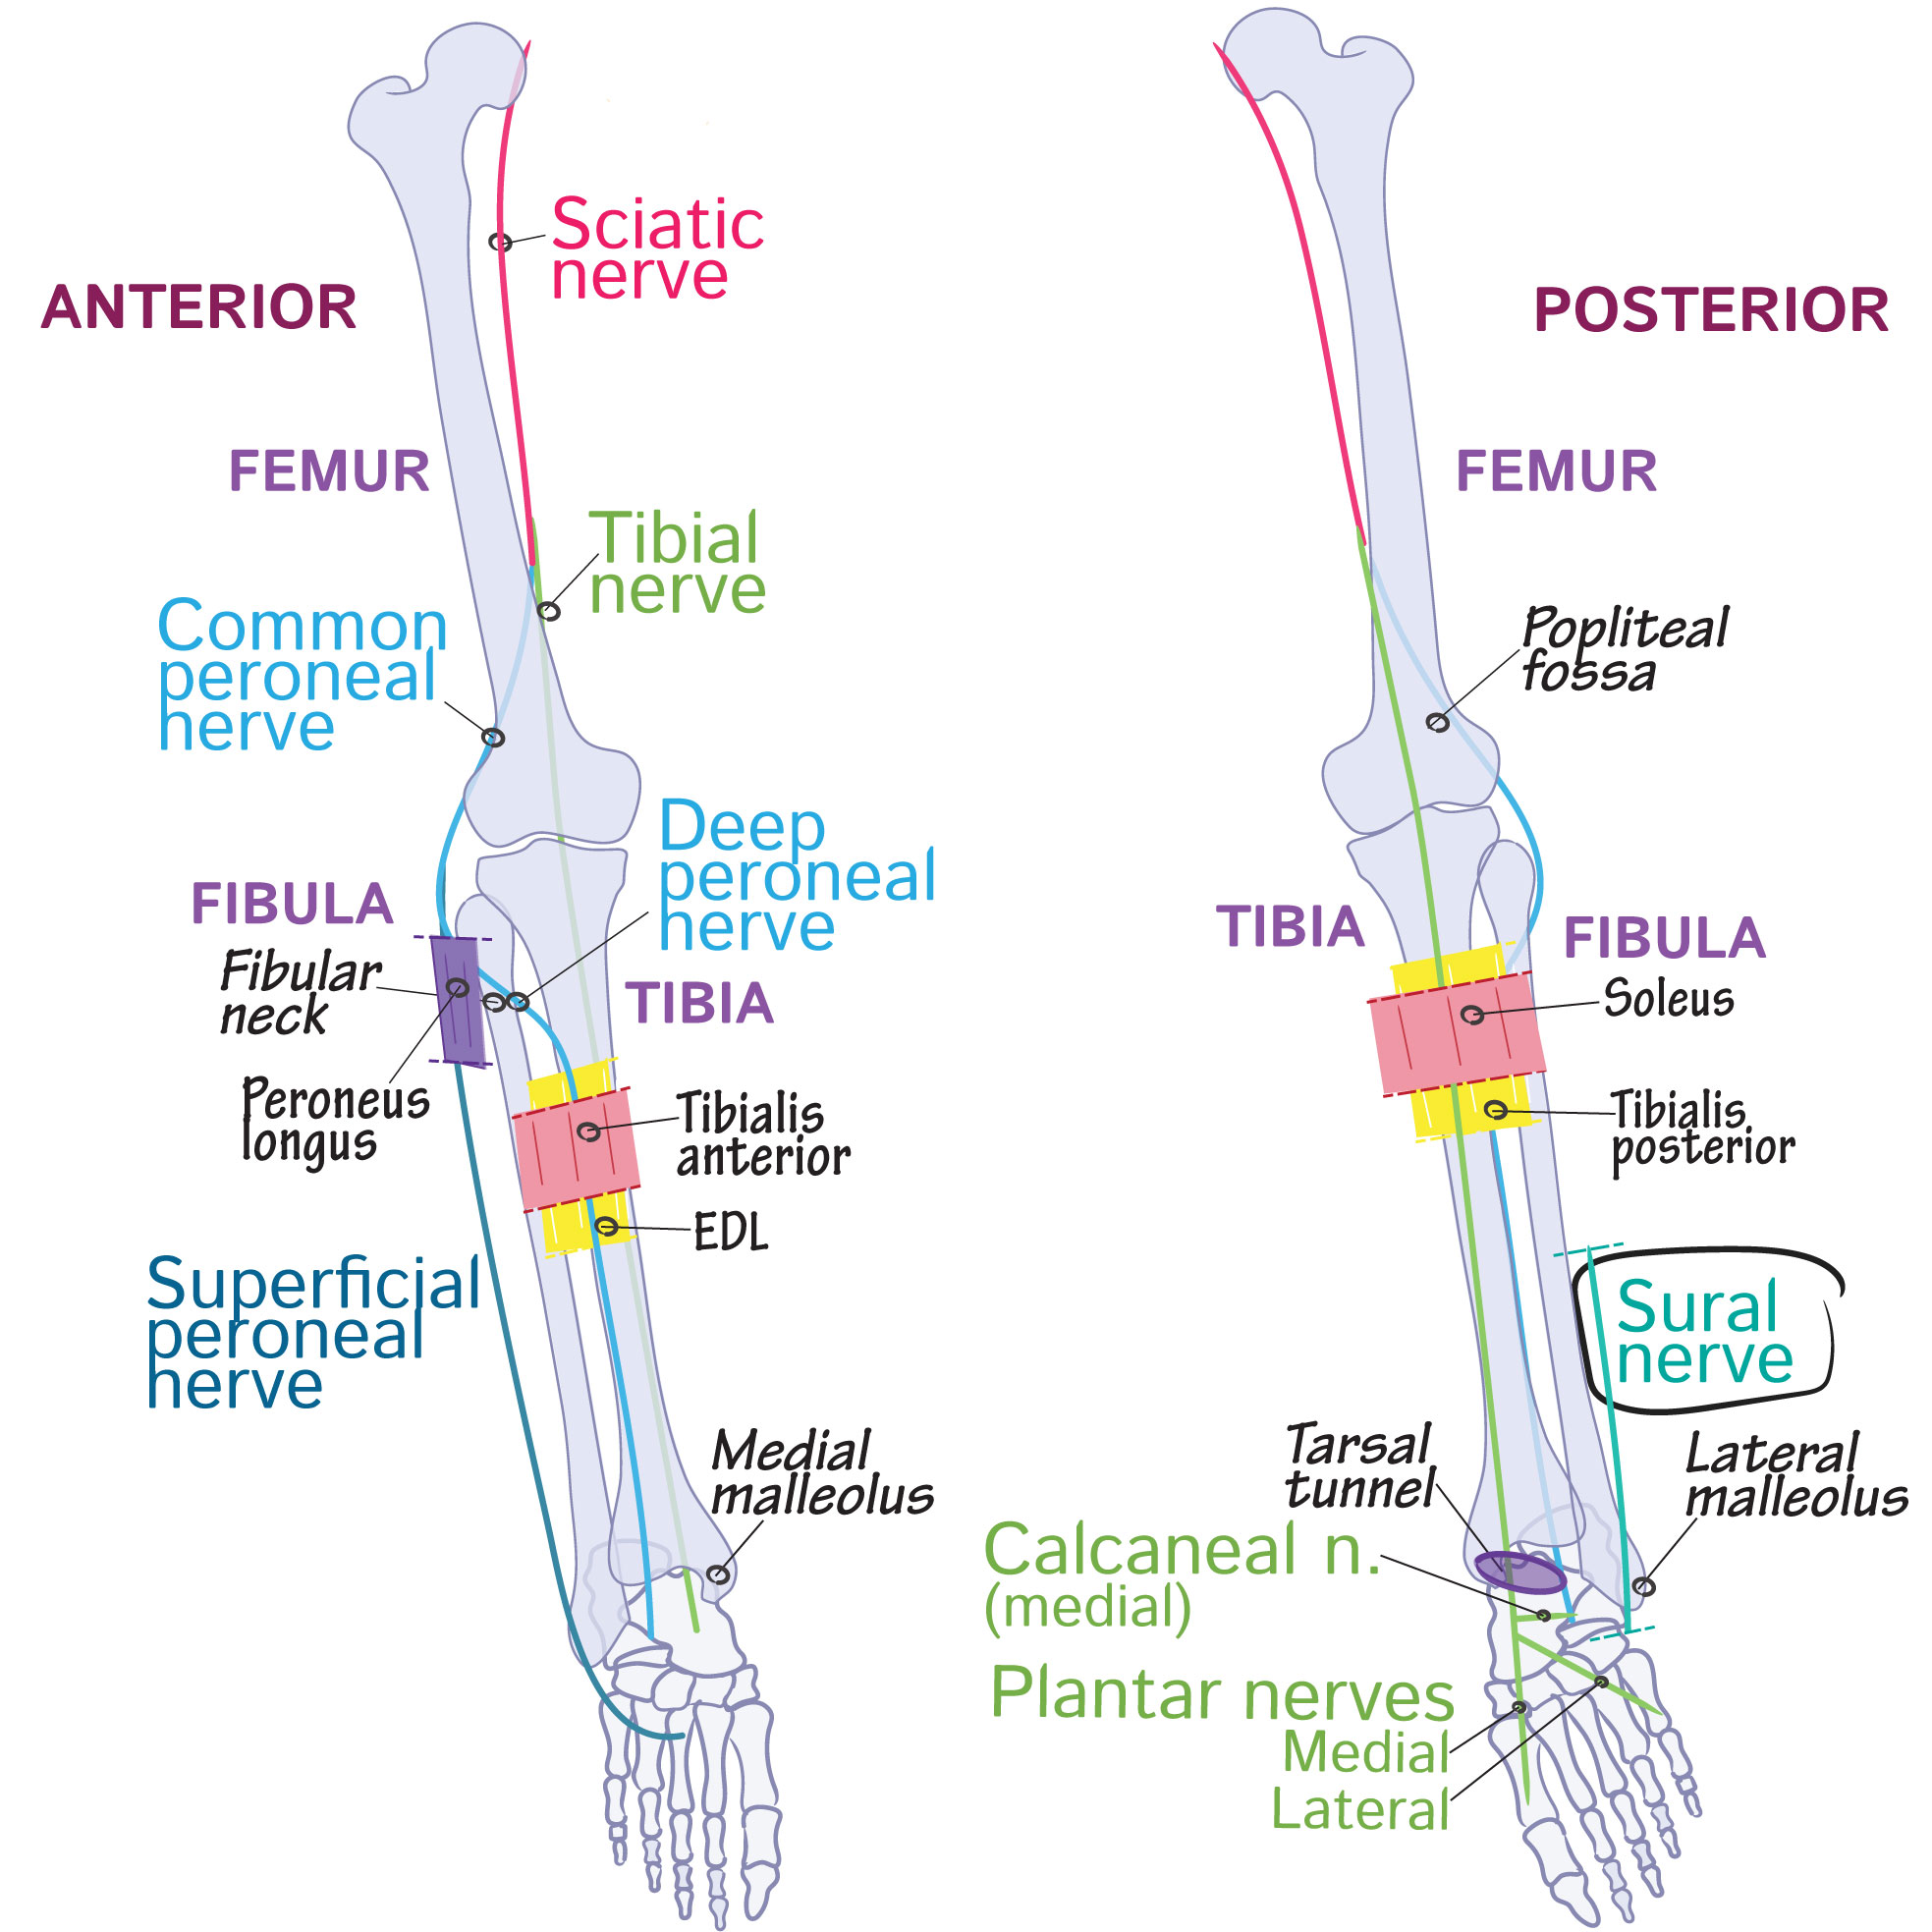 Gross Anatomy Glossary Lower Limb Sural Nerve Cutaneous Draw